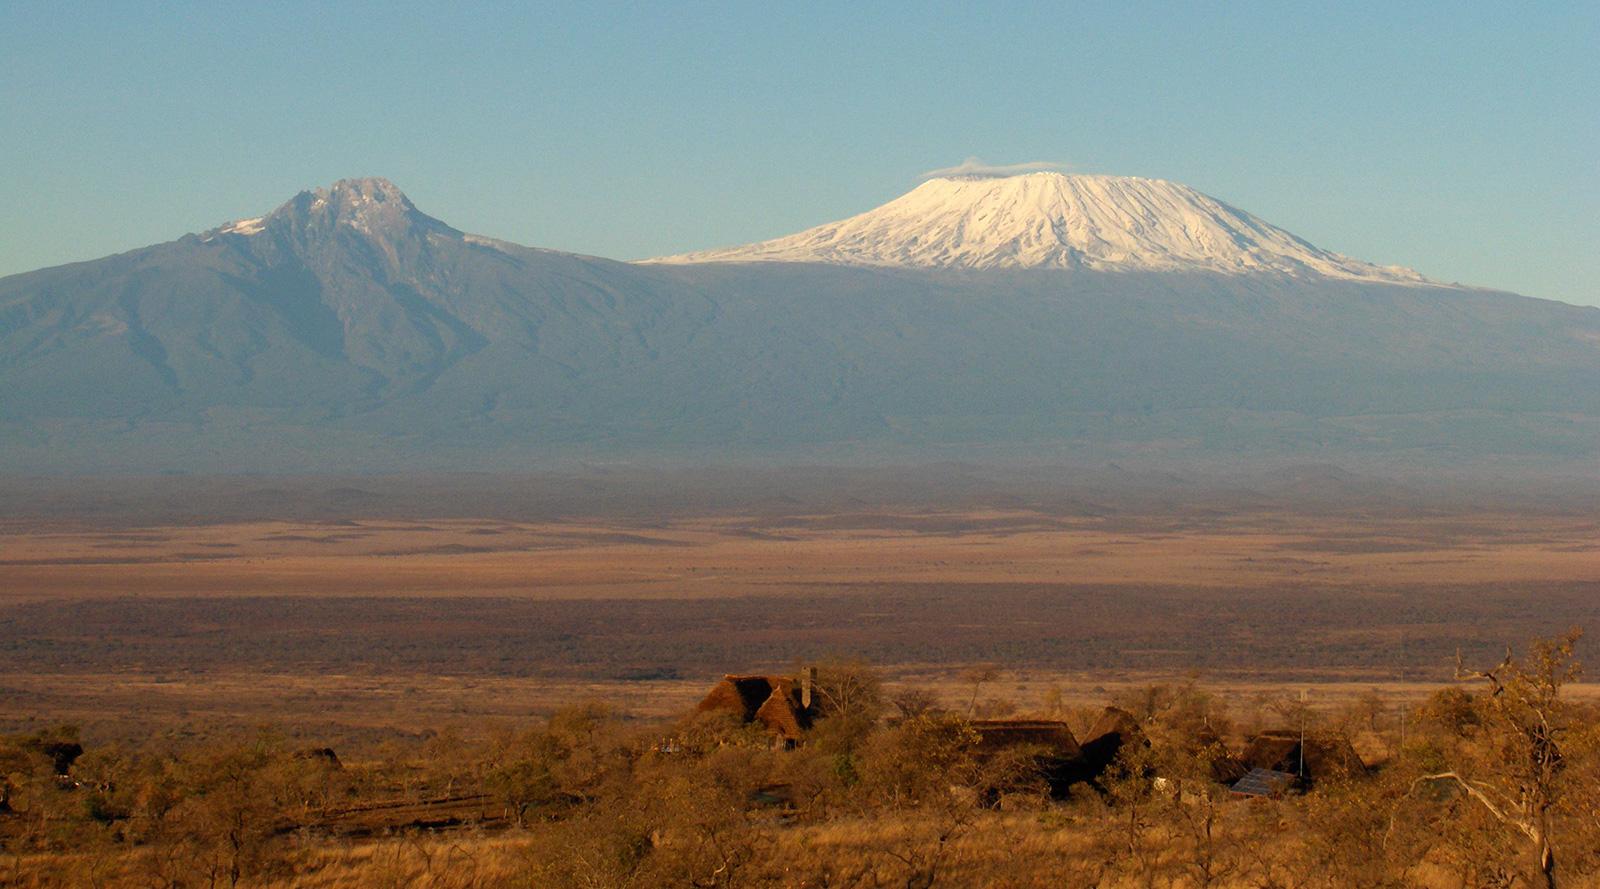 © Campi ya Kanzi | Campi Ya Kanzi, Monte Kilimanjaro, vista dal Kenya